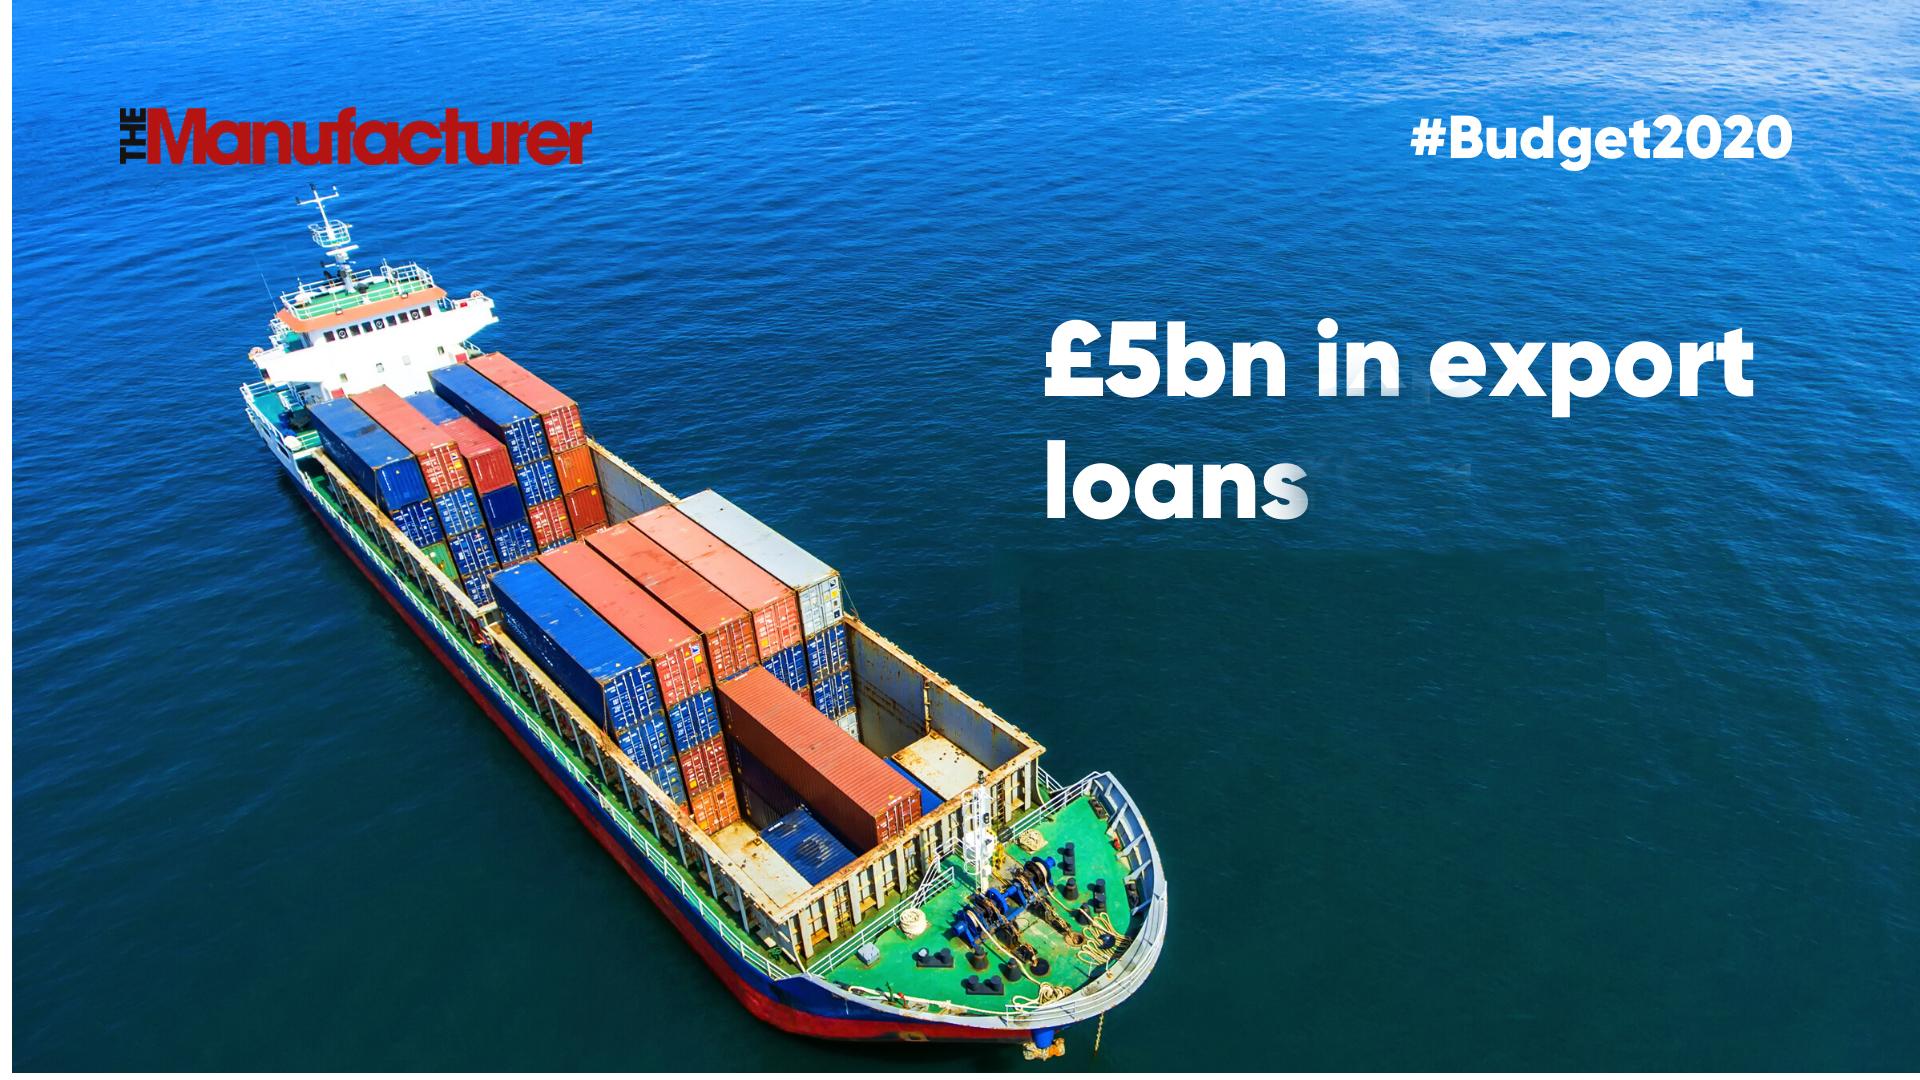 Budget 2020 - Export Loans